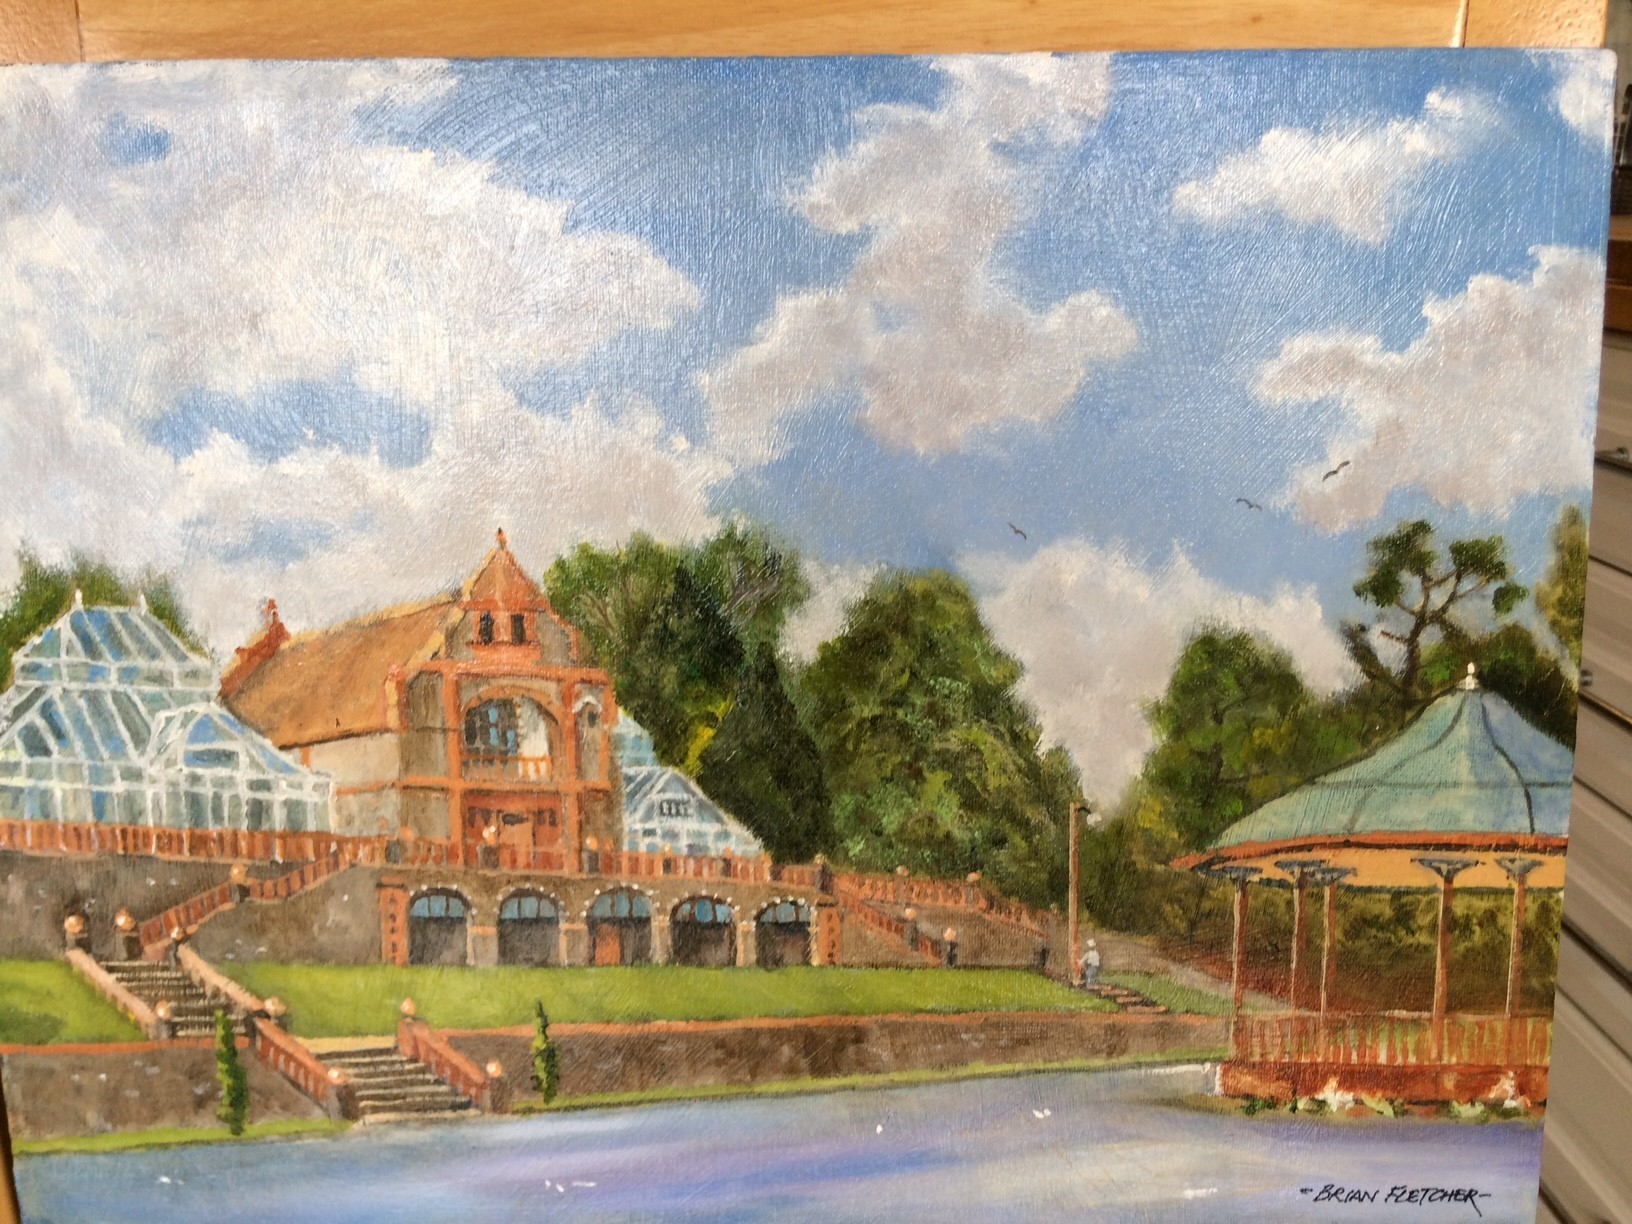 High Cross artist creates Belle Vue Park paintings